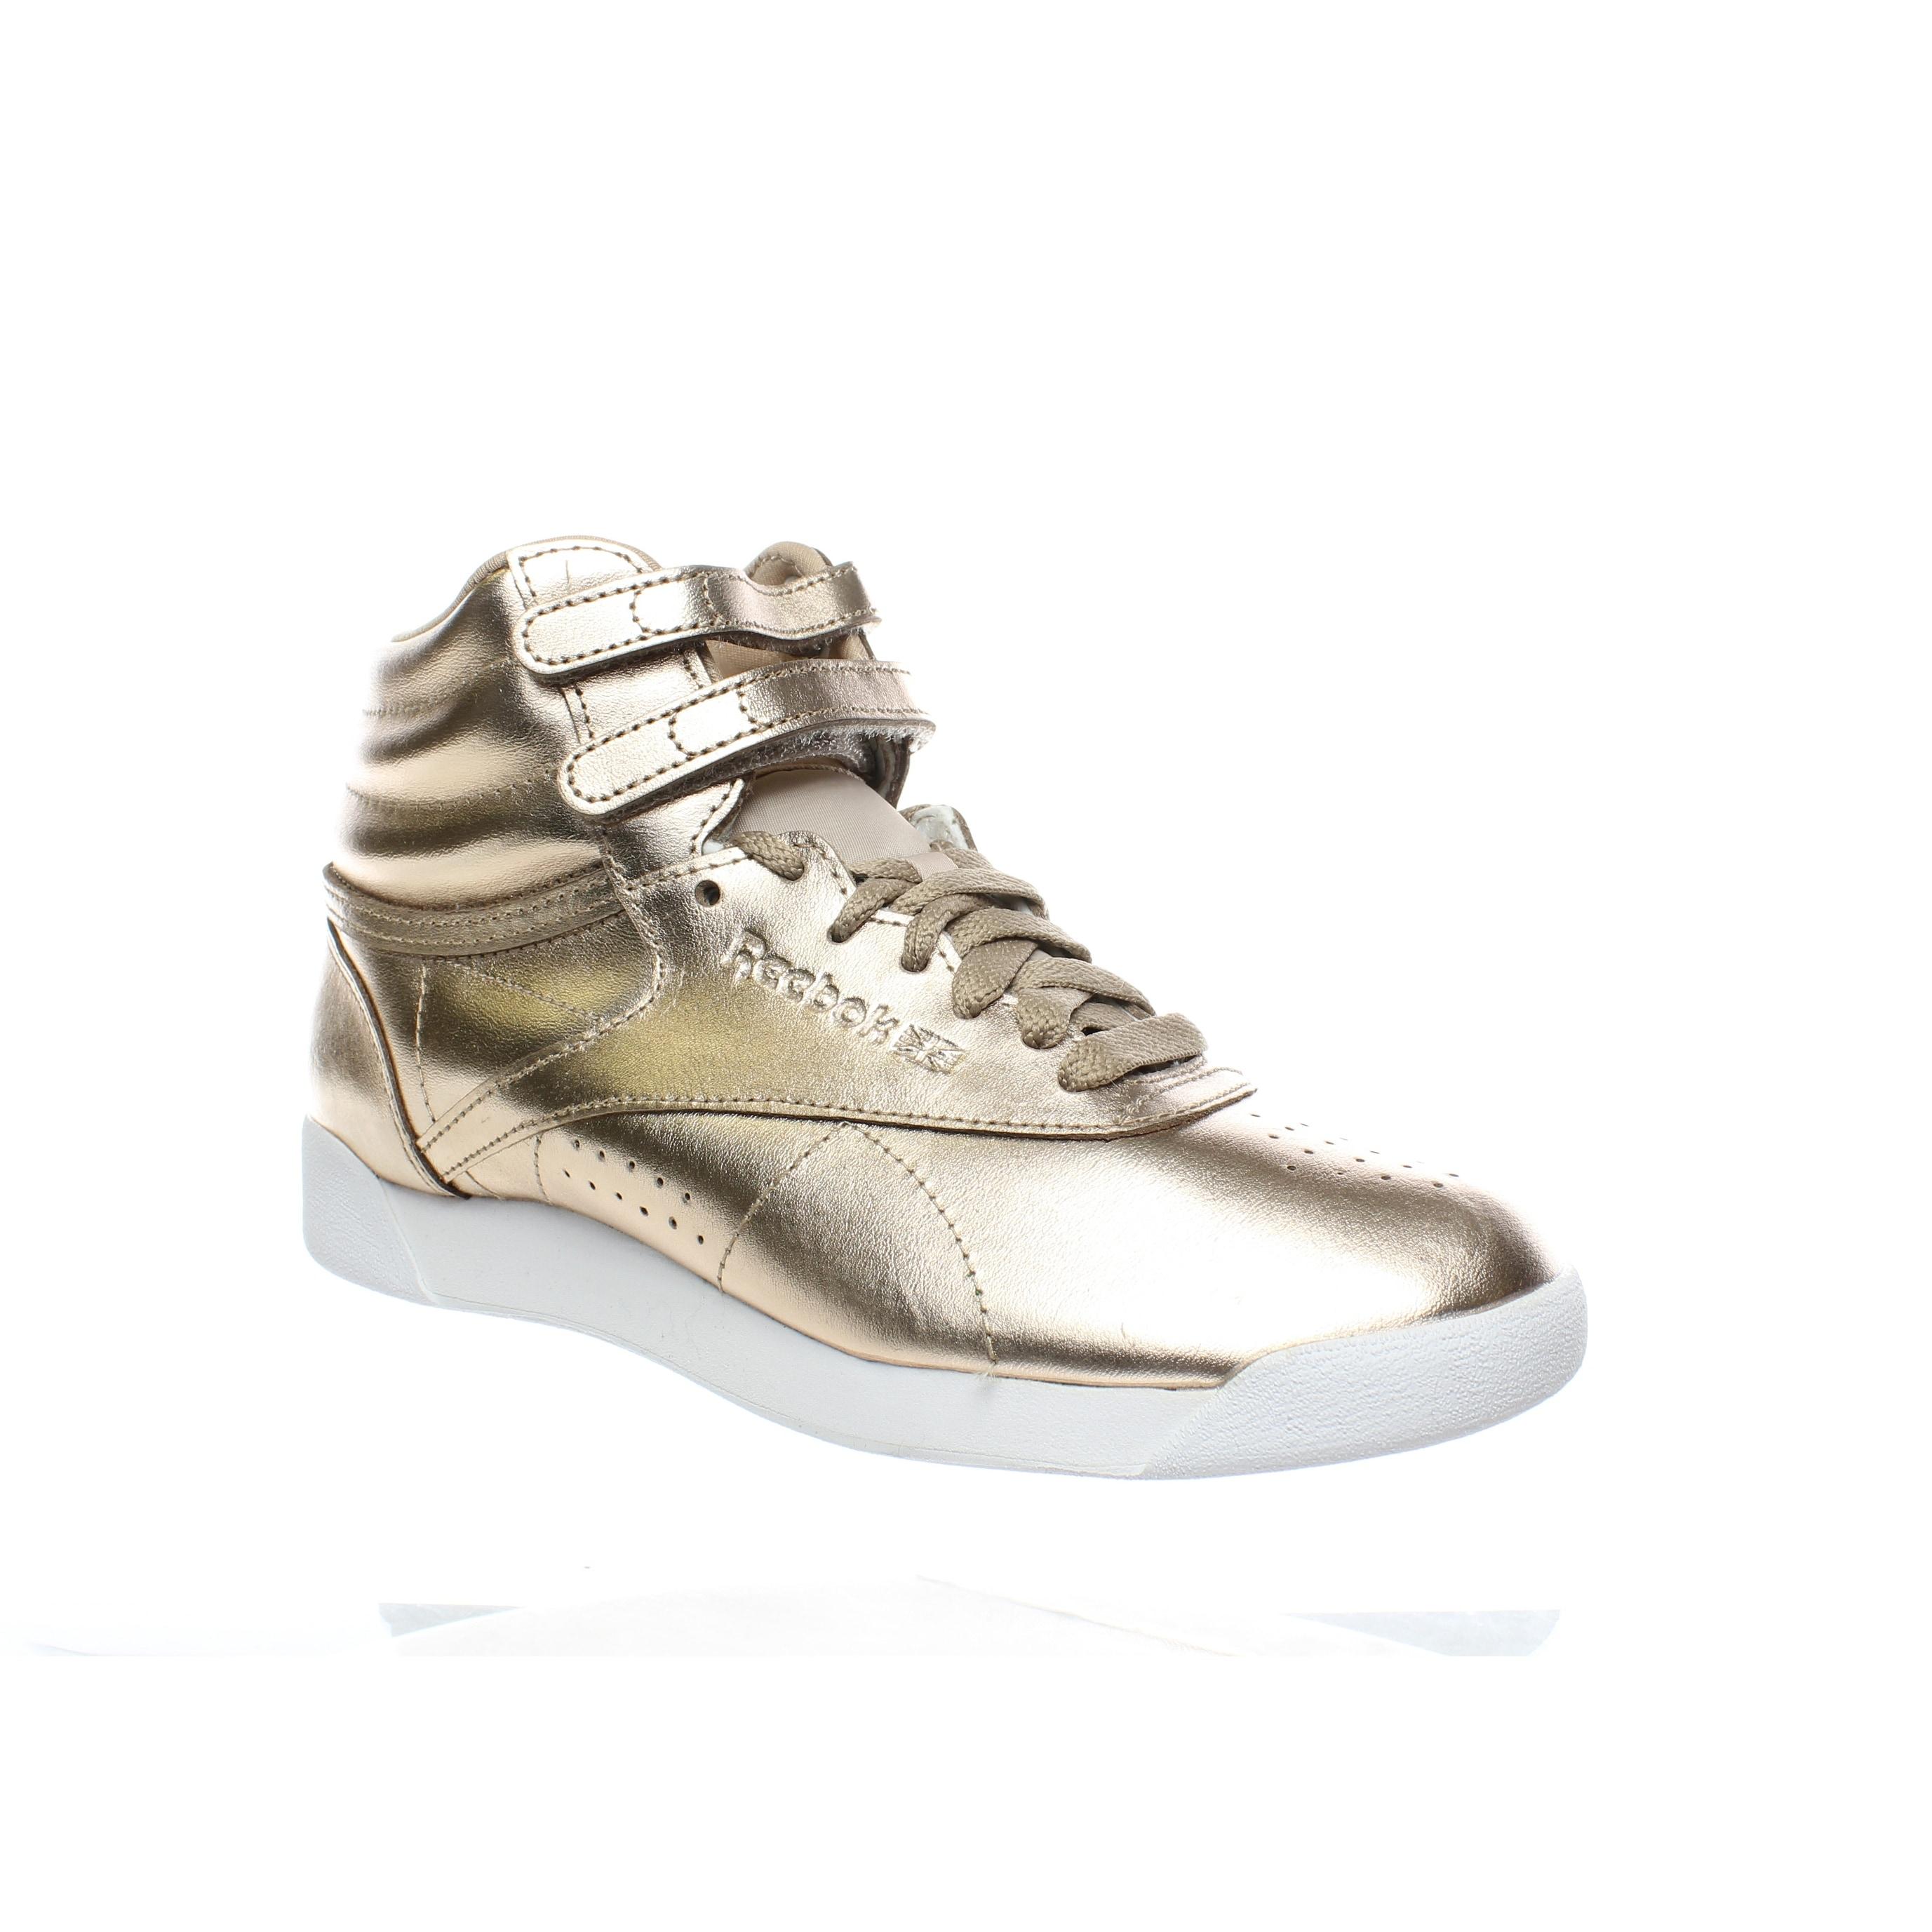 Reebok Womens F/S Hi Metallic Rose Gold